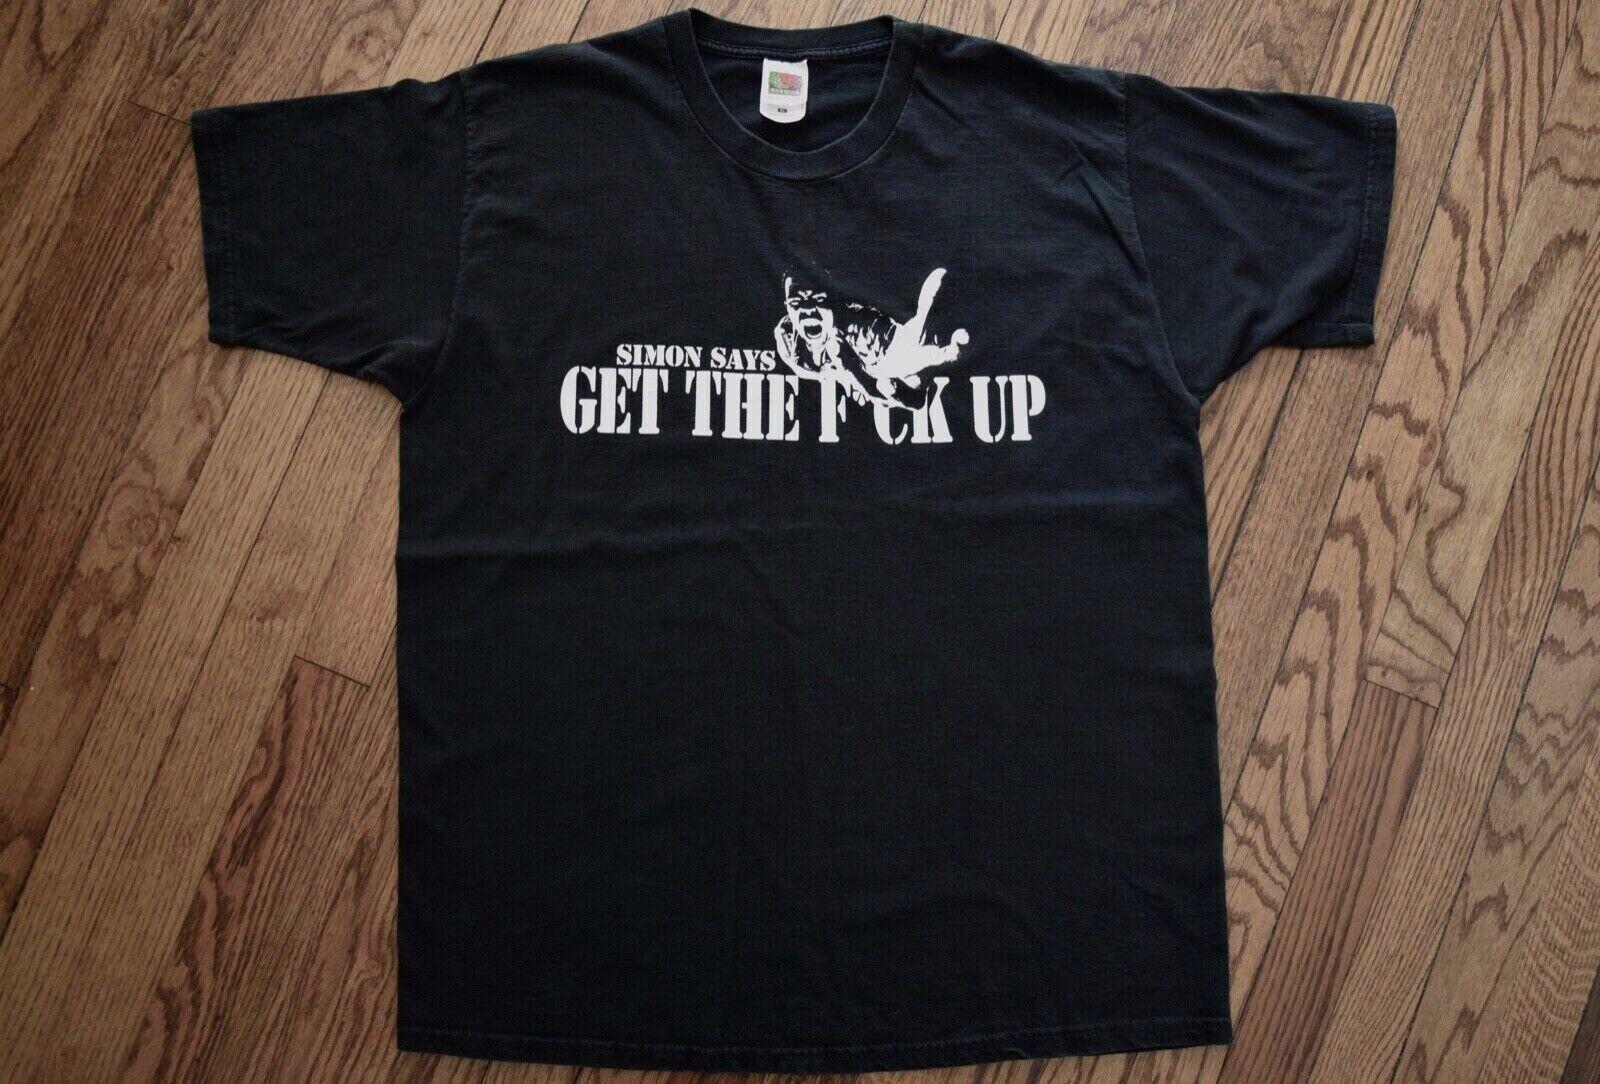 1999 pharoahe monch RAWKUS RECORDS promo vtg 90s rap hip hop blackstar T-shirt